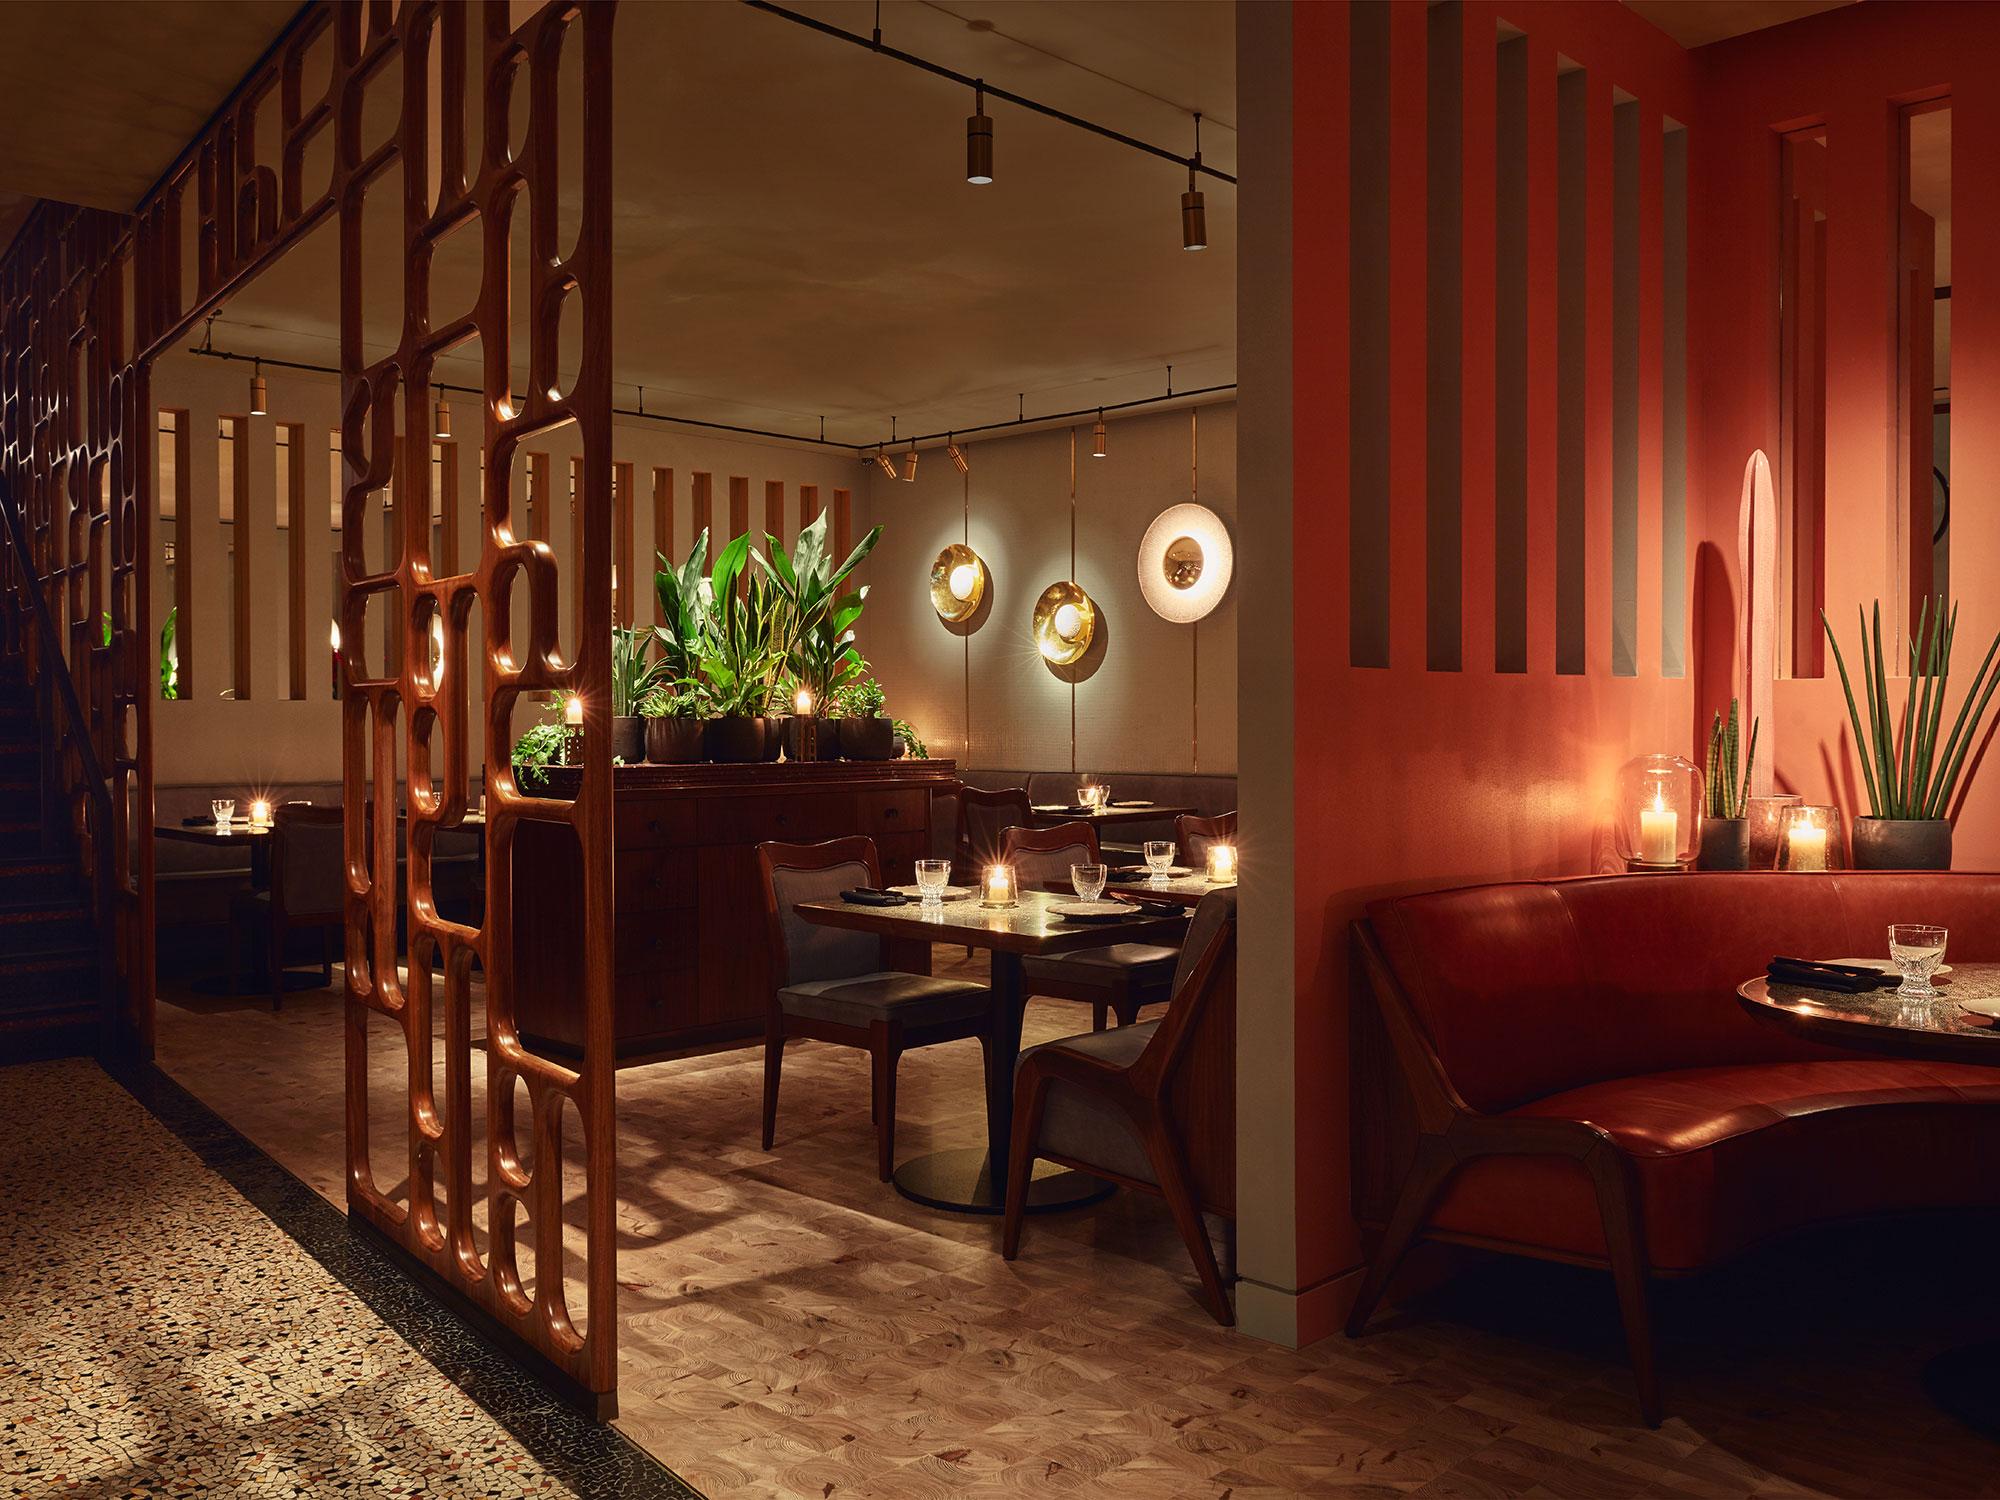 IHG_1048_Restaurant_Identity_Gallery_Images11.jpg